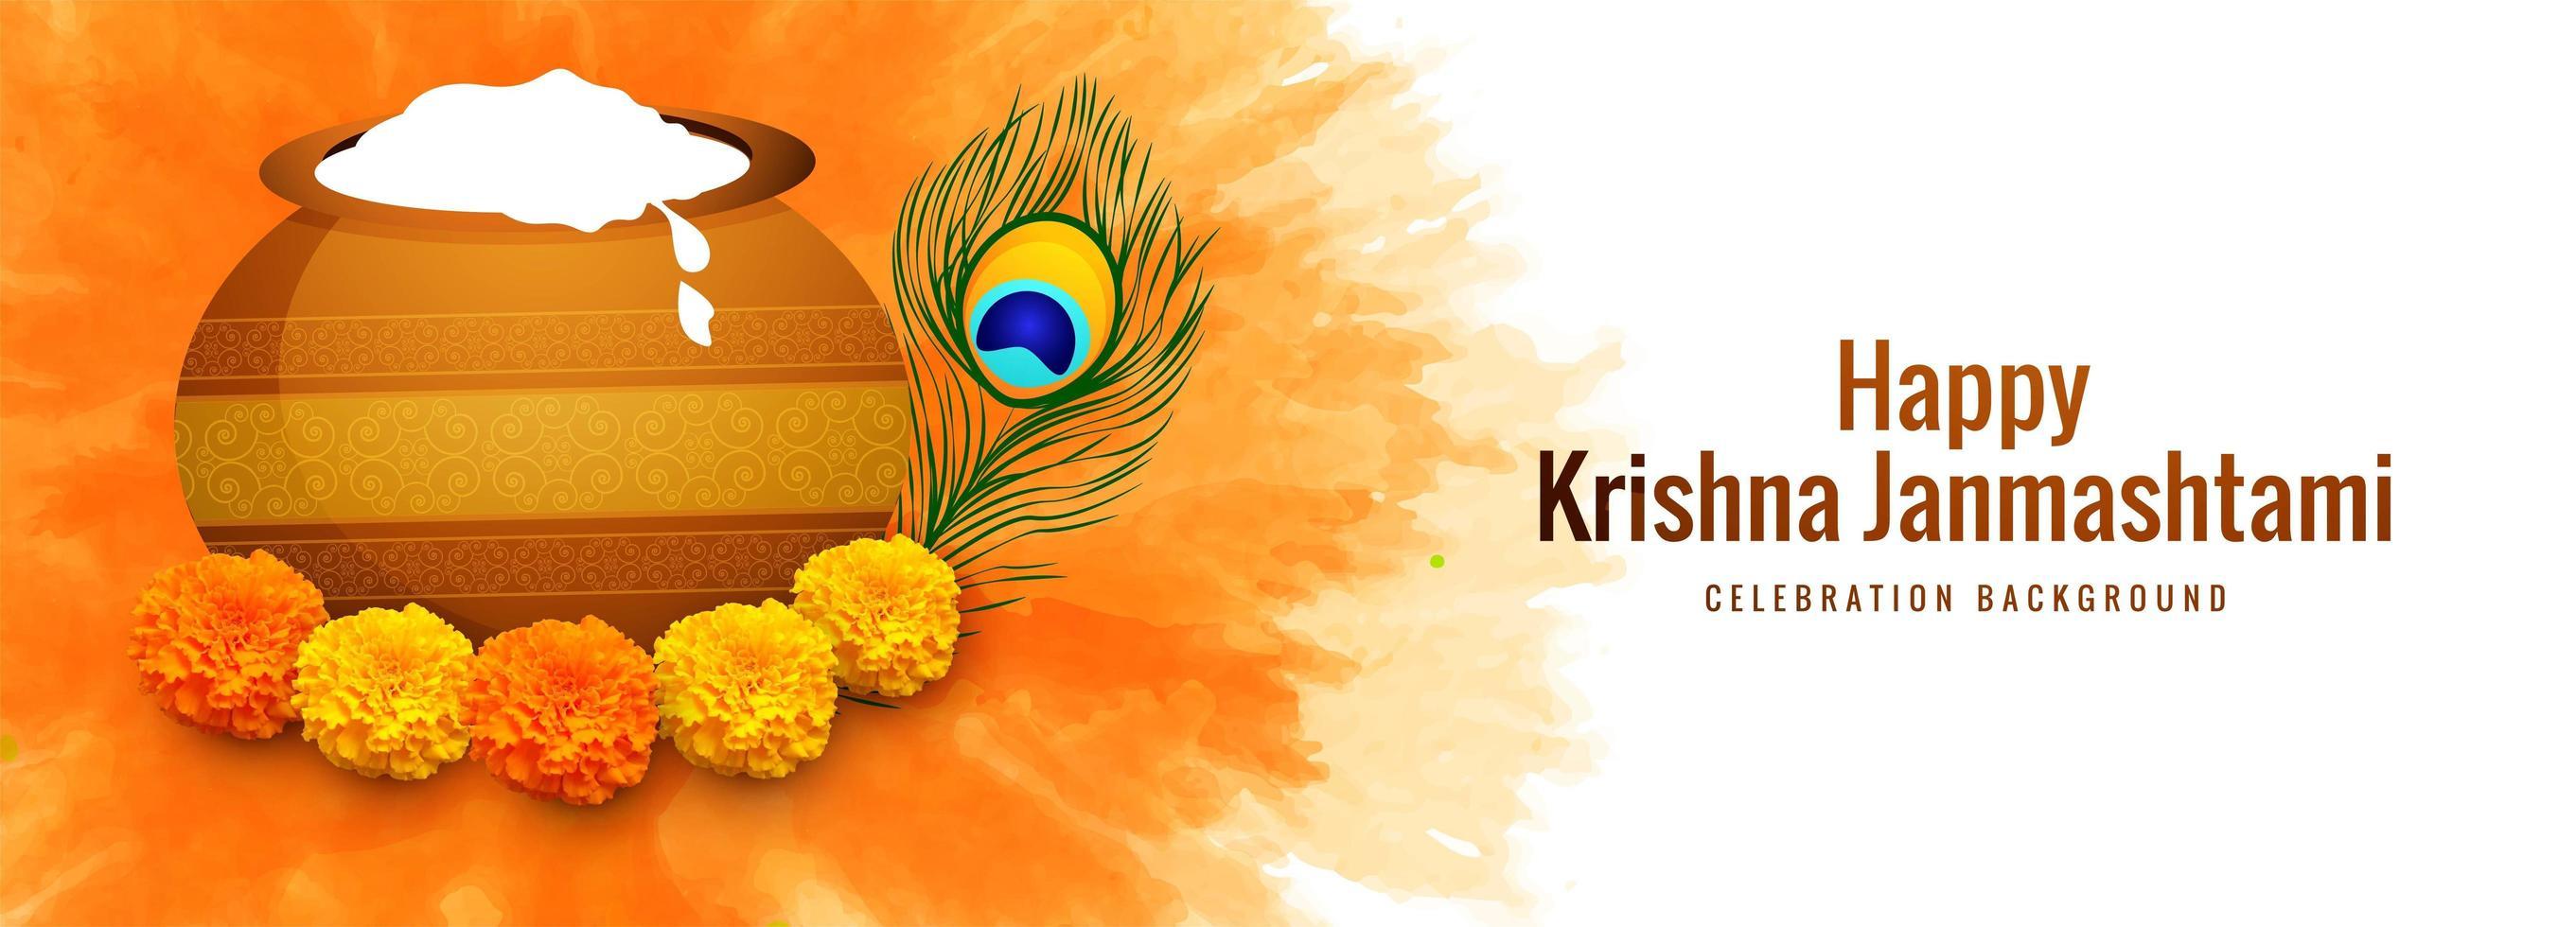 feliz celebración janmashtami tarjeta religiosa banner vector